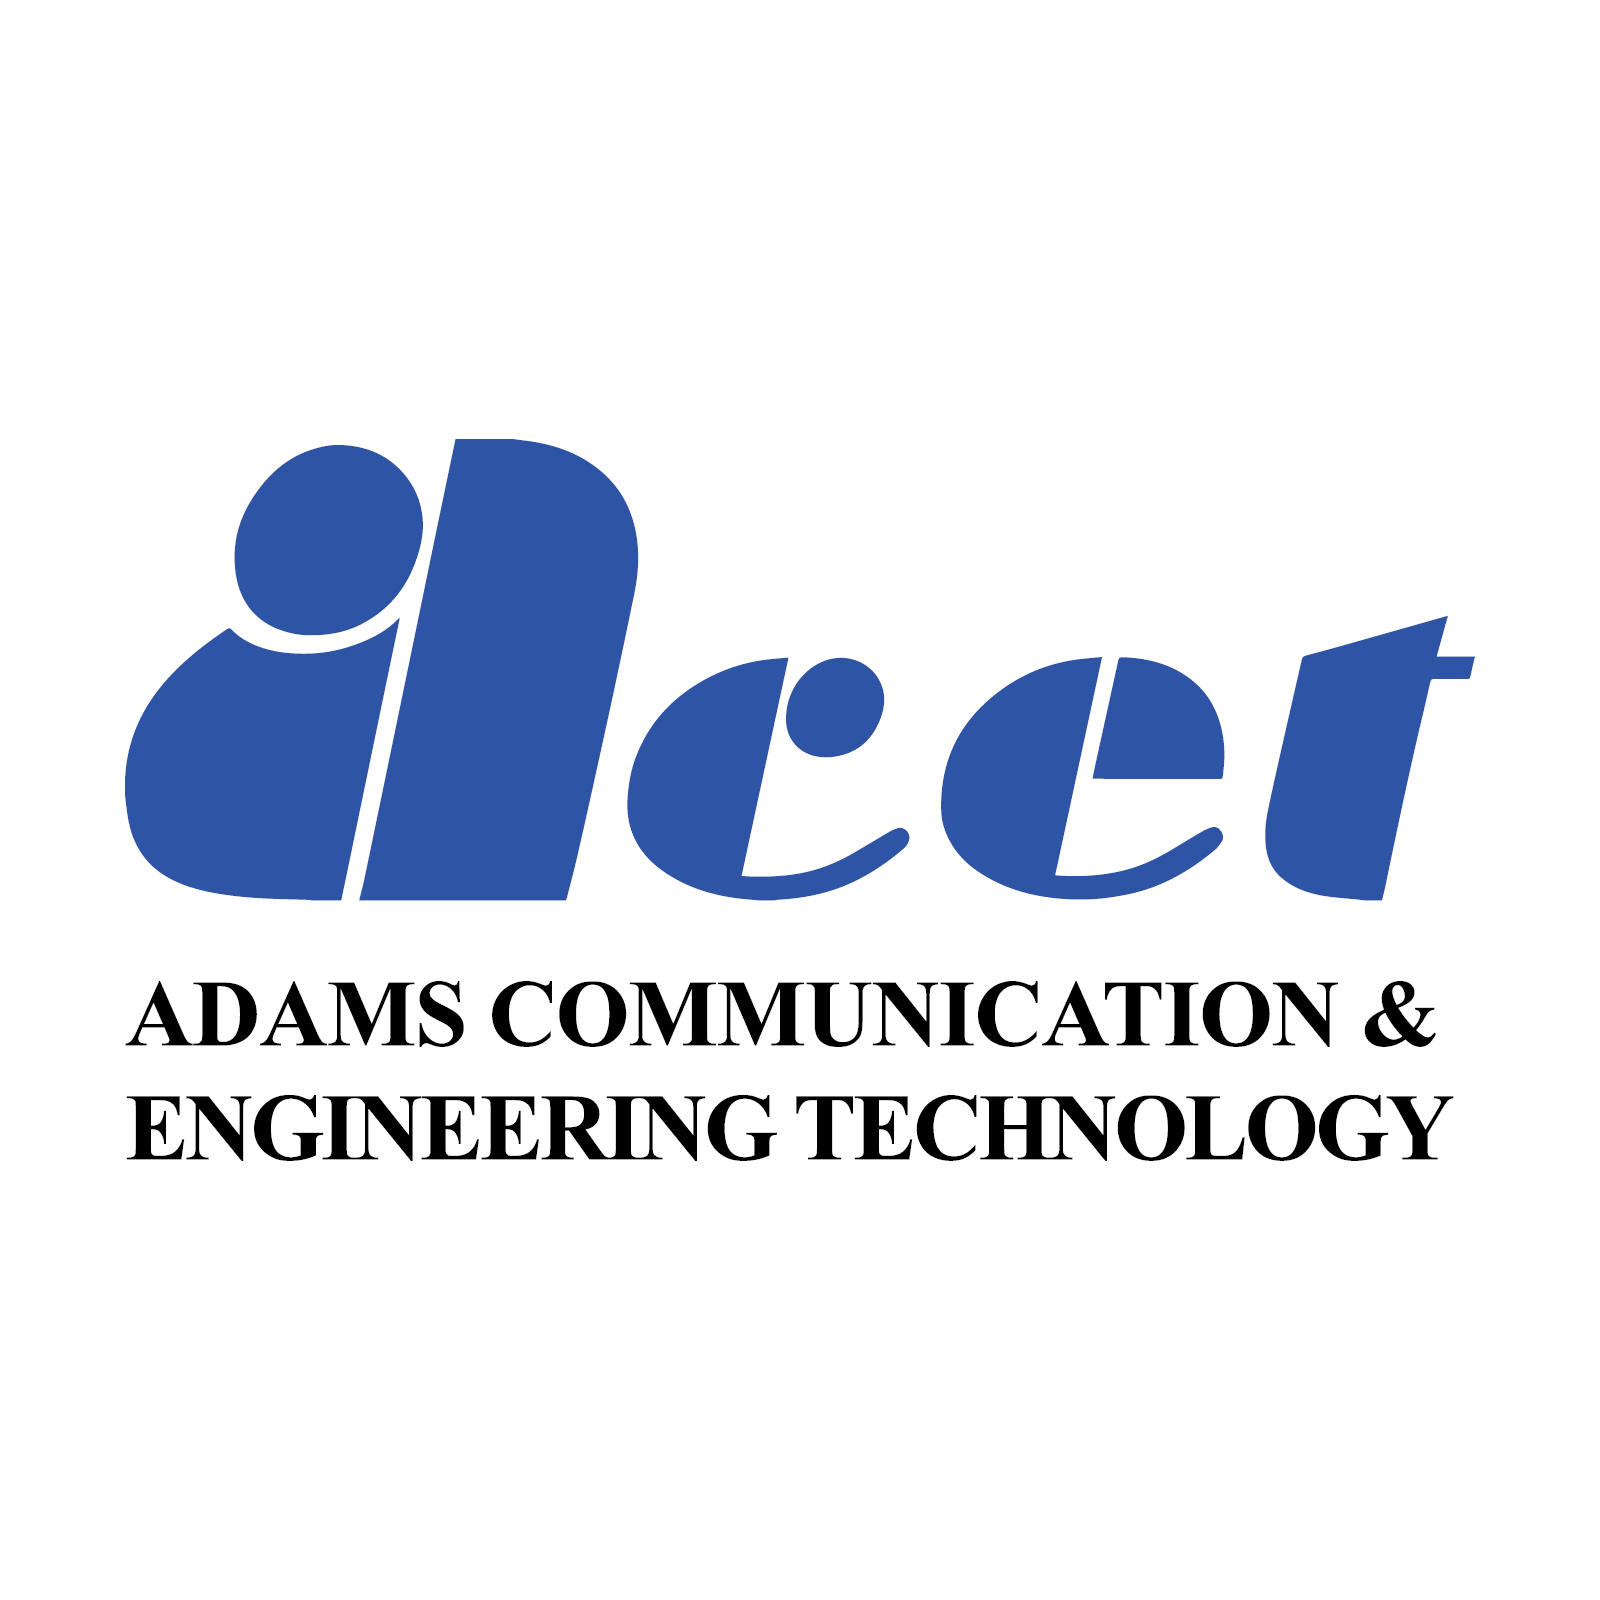 Adams Communication & Engineering Technology